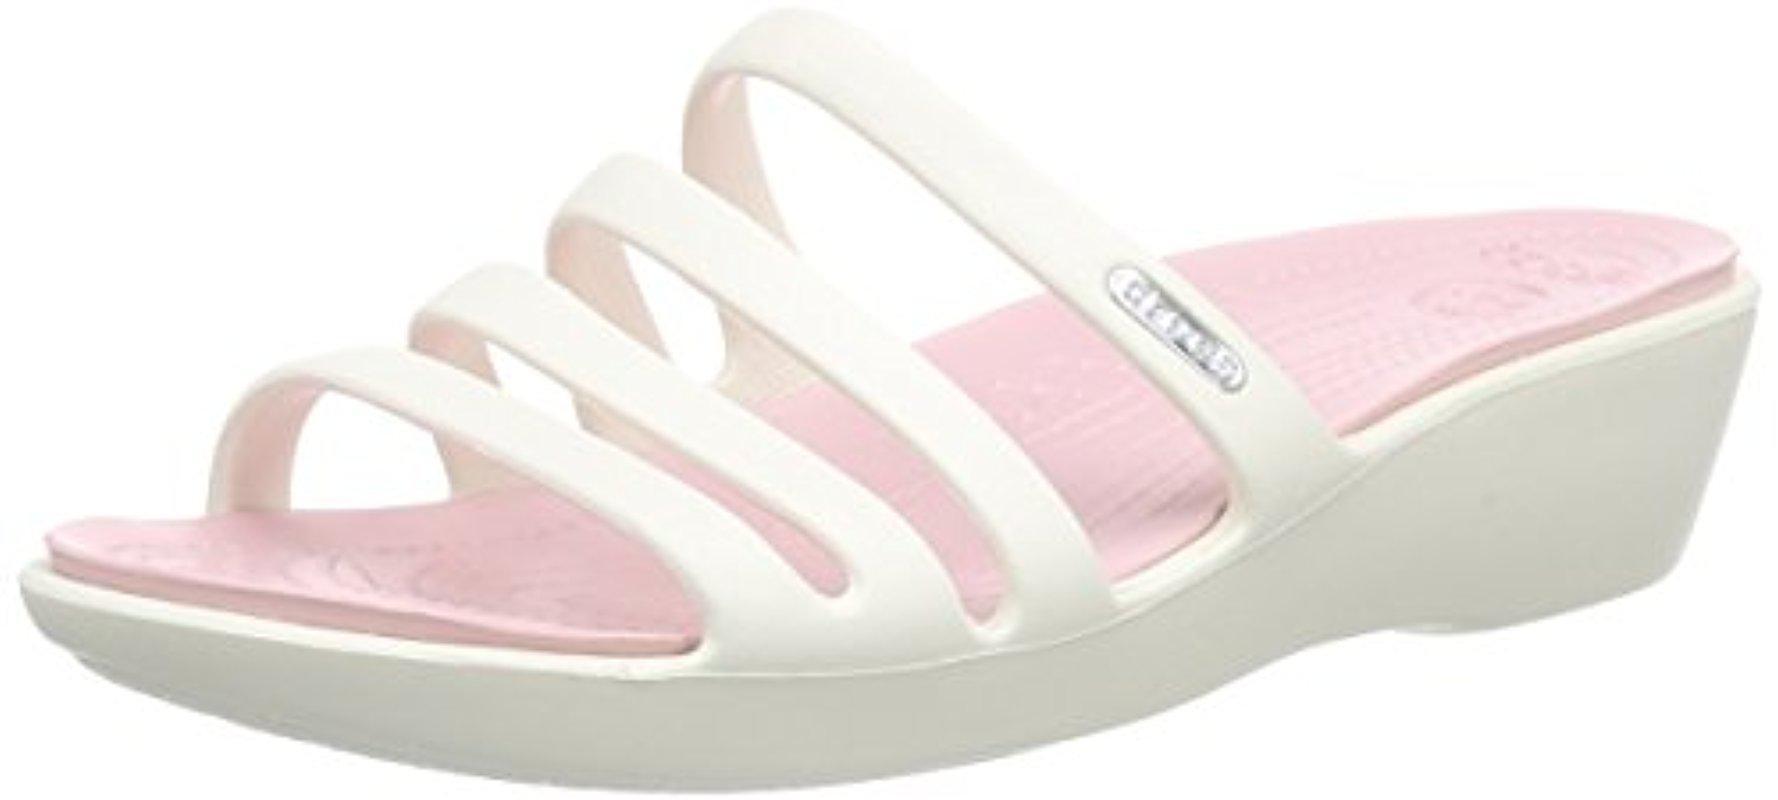 b65eecfdc1e Lyst - Crocs™ Rhonda Wedge Pump in Pink